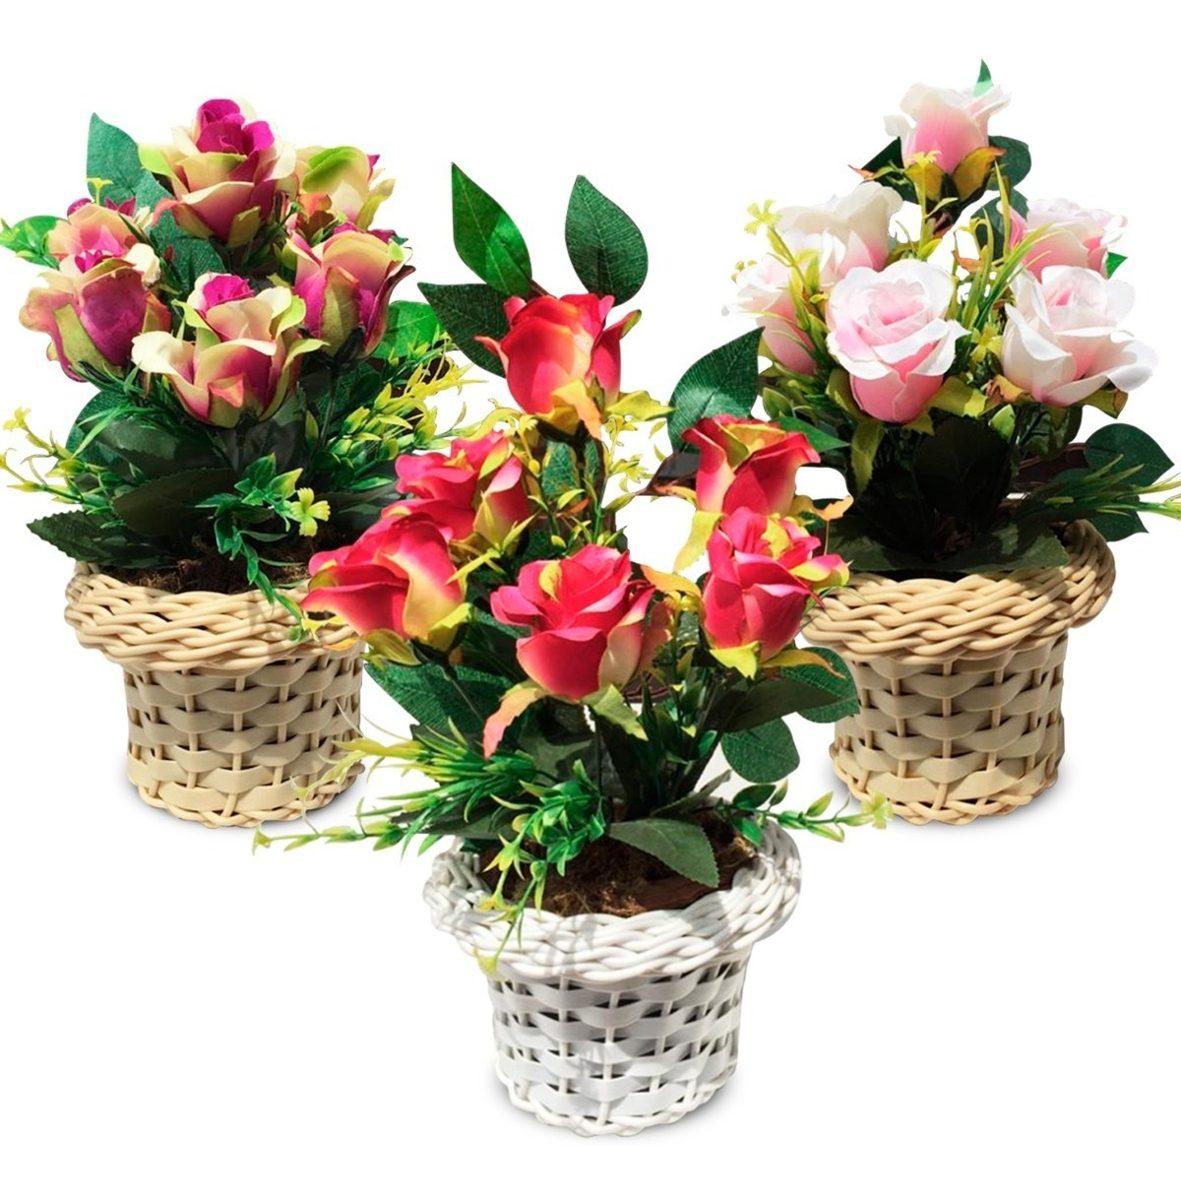 Arranjo de Flores Rosa Artificiais Vaso Artificial Flor